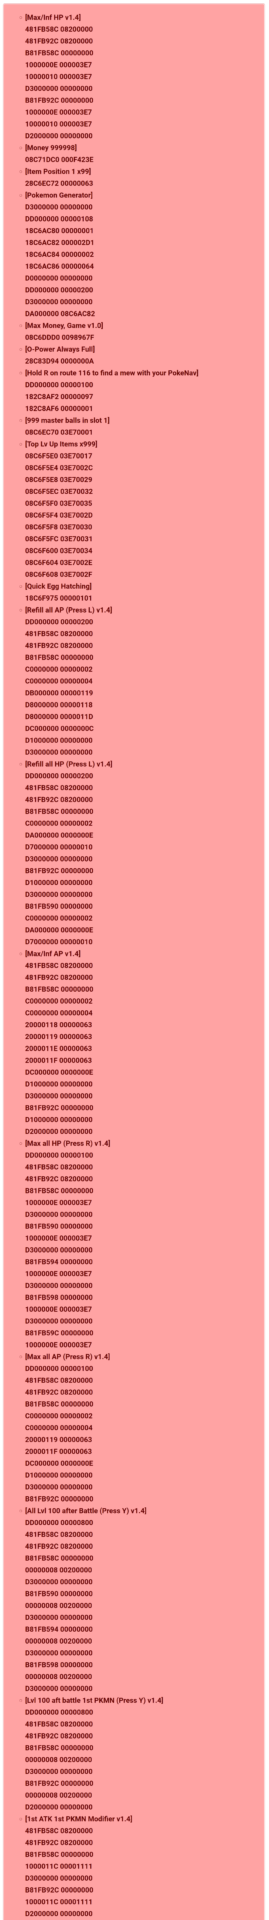 Pokemon Omega Ruby Cheats list